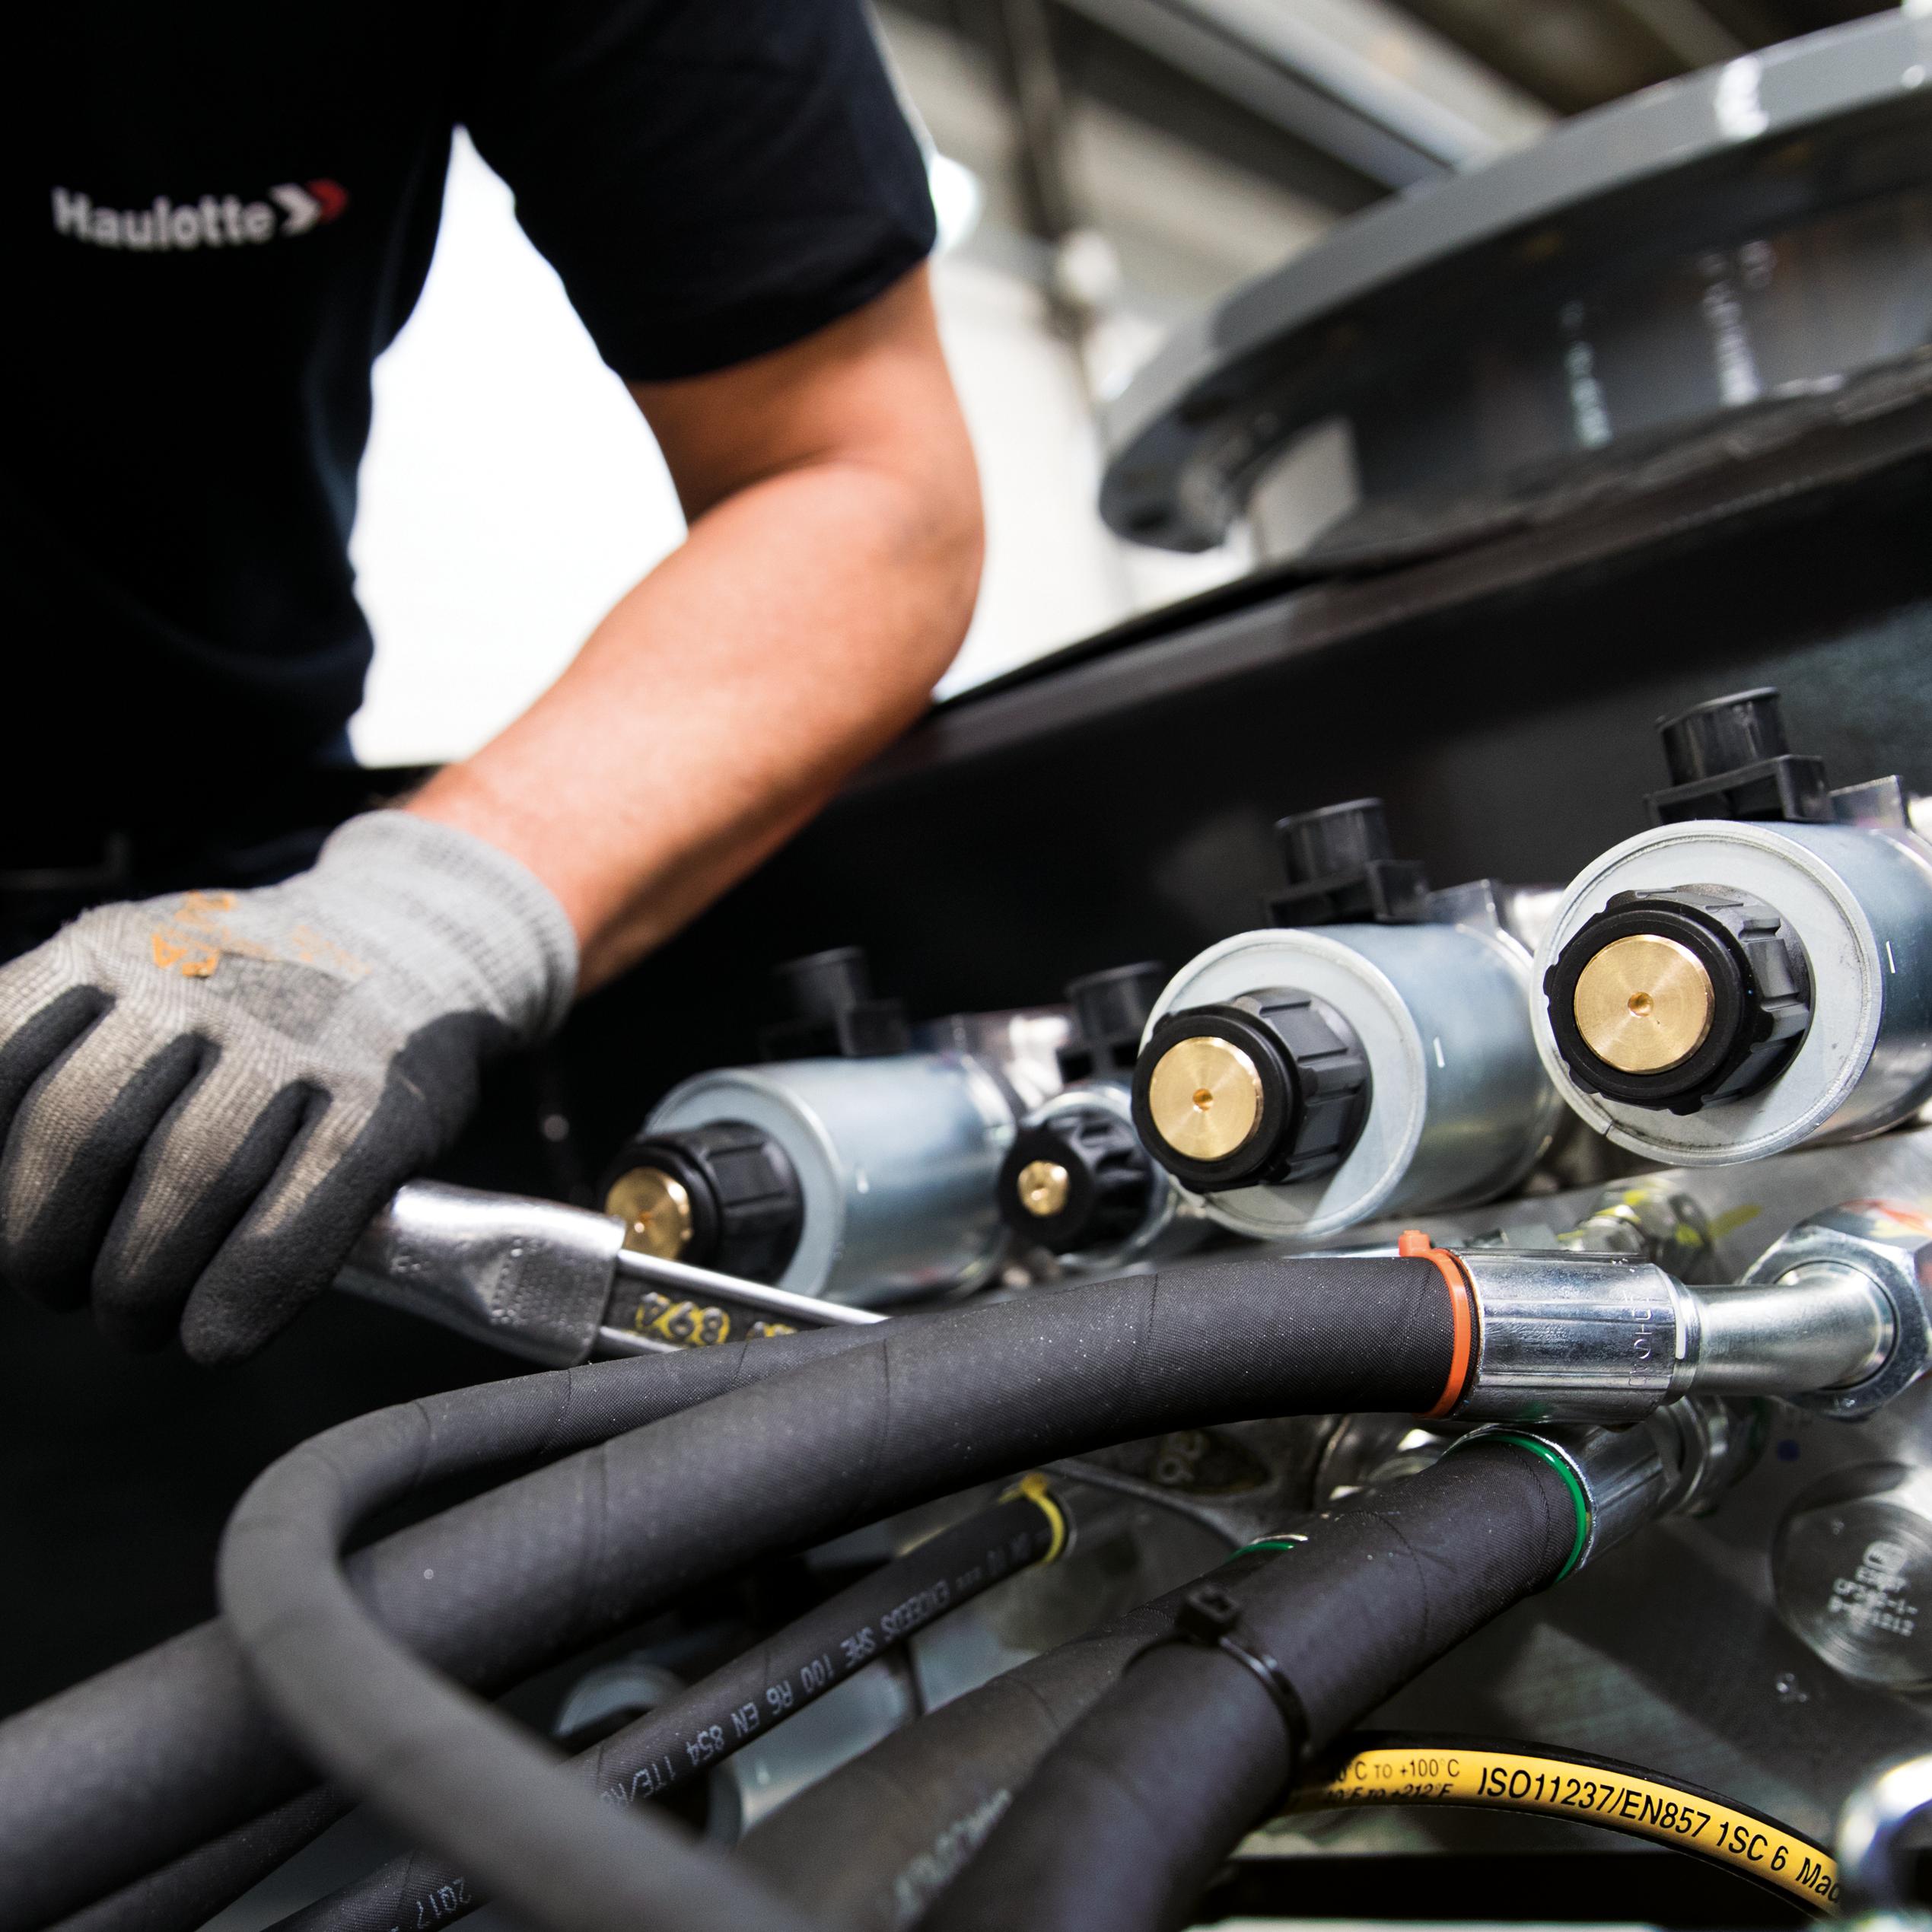 Haulotte Manuals 202014 20ford F150 Trailer Wiring Harness Diagram Array Our Services Australia Rh Com Au